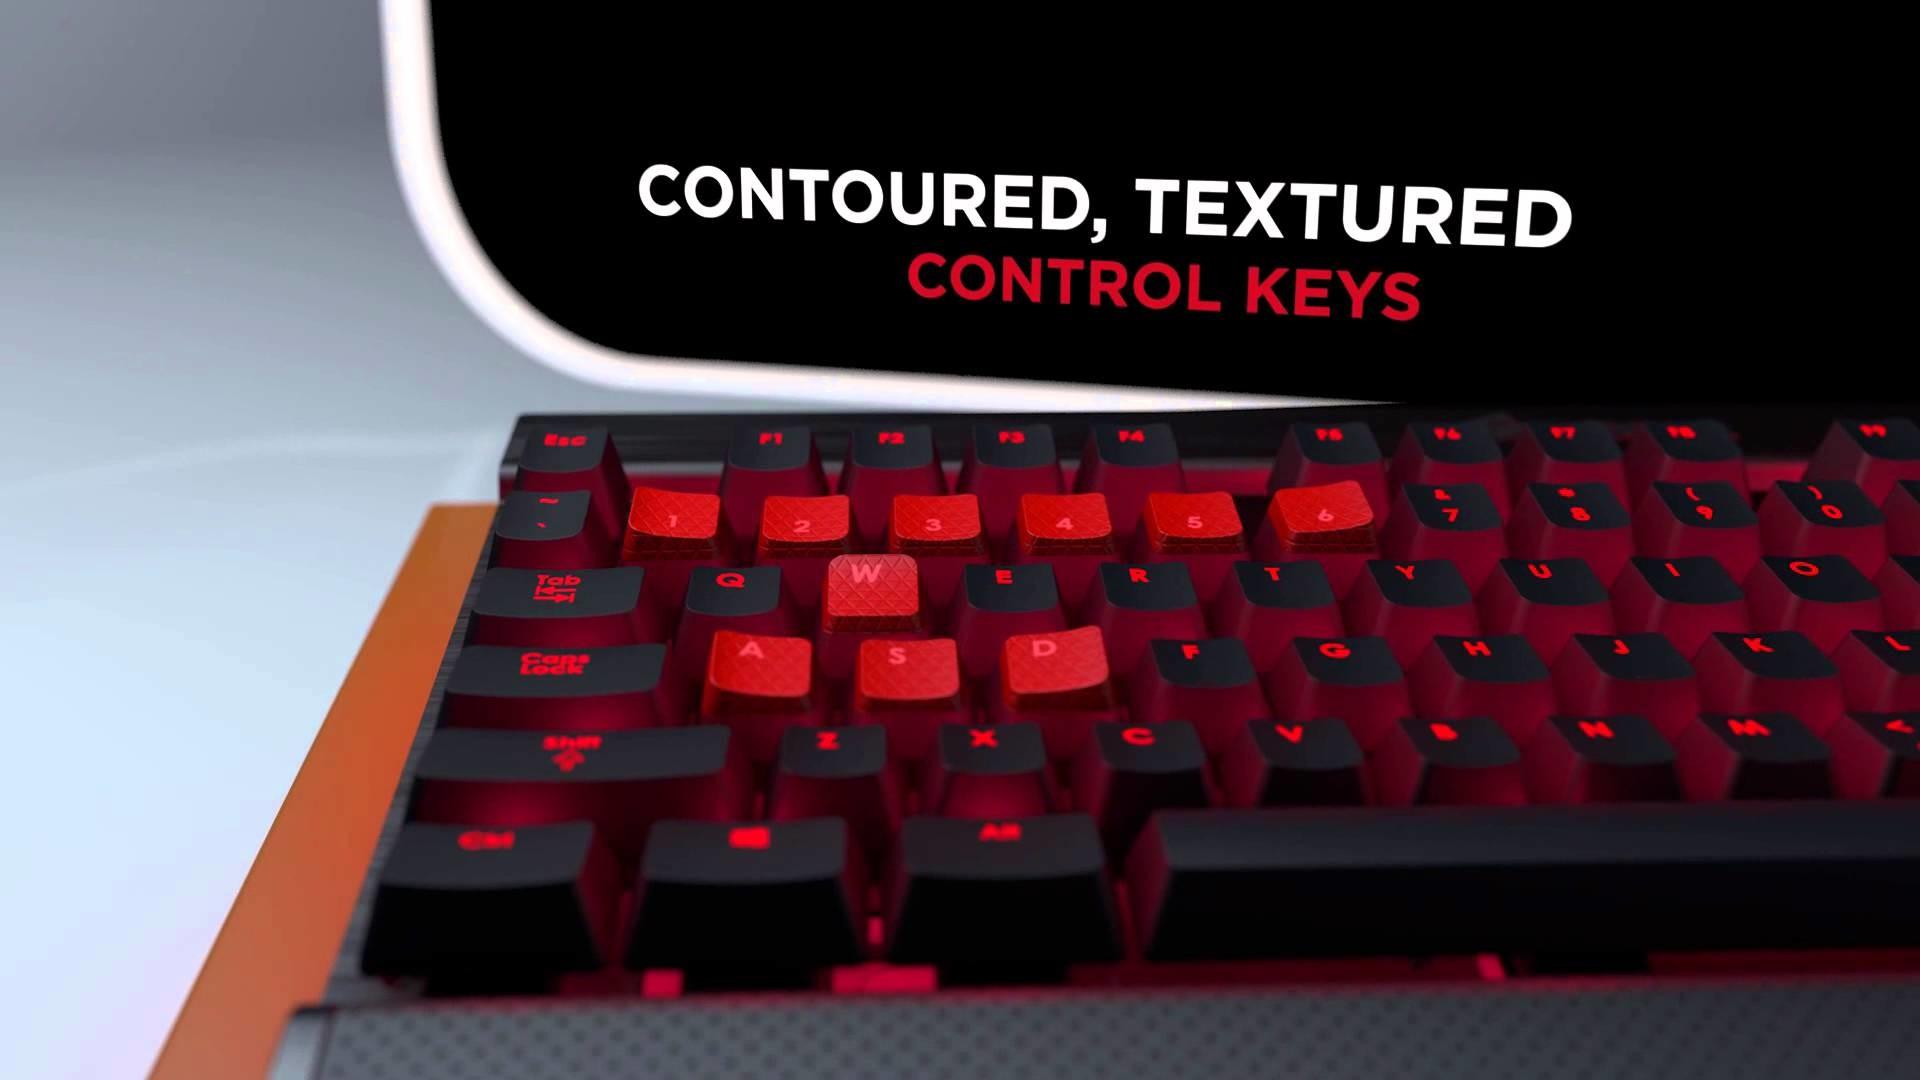 Corsair Vengeance K70 mechanical gaming keyboard showcase